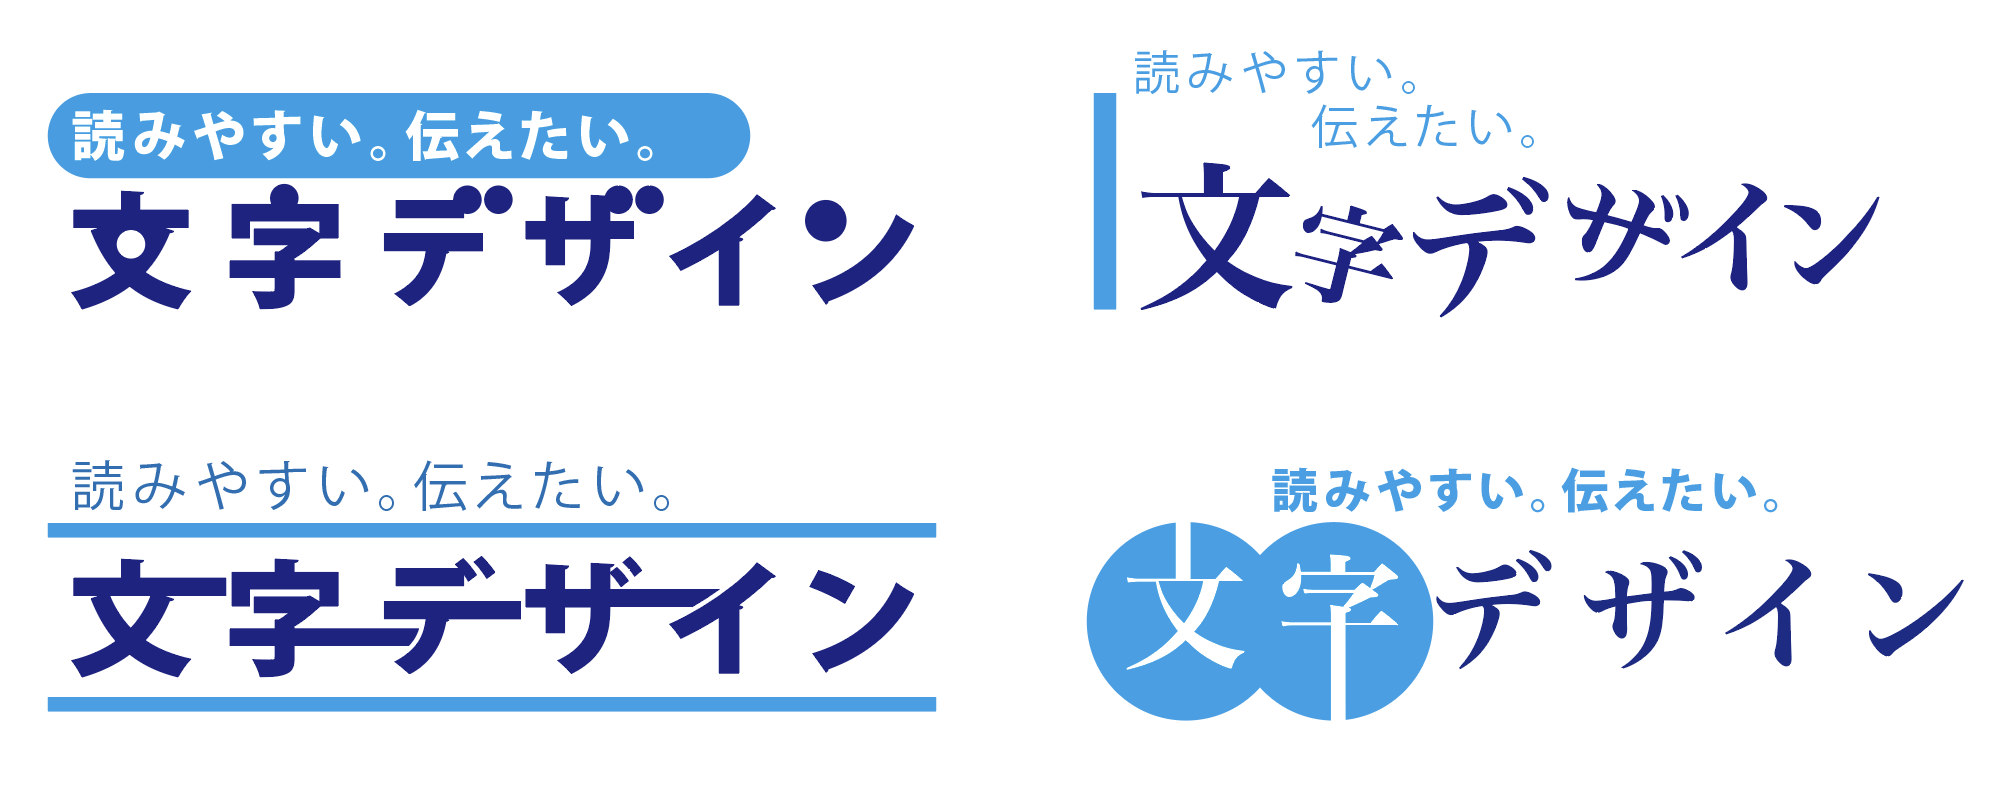 Illustrator_typesetting05